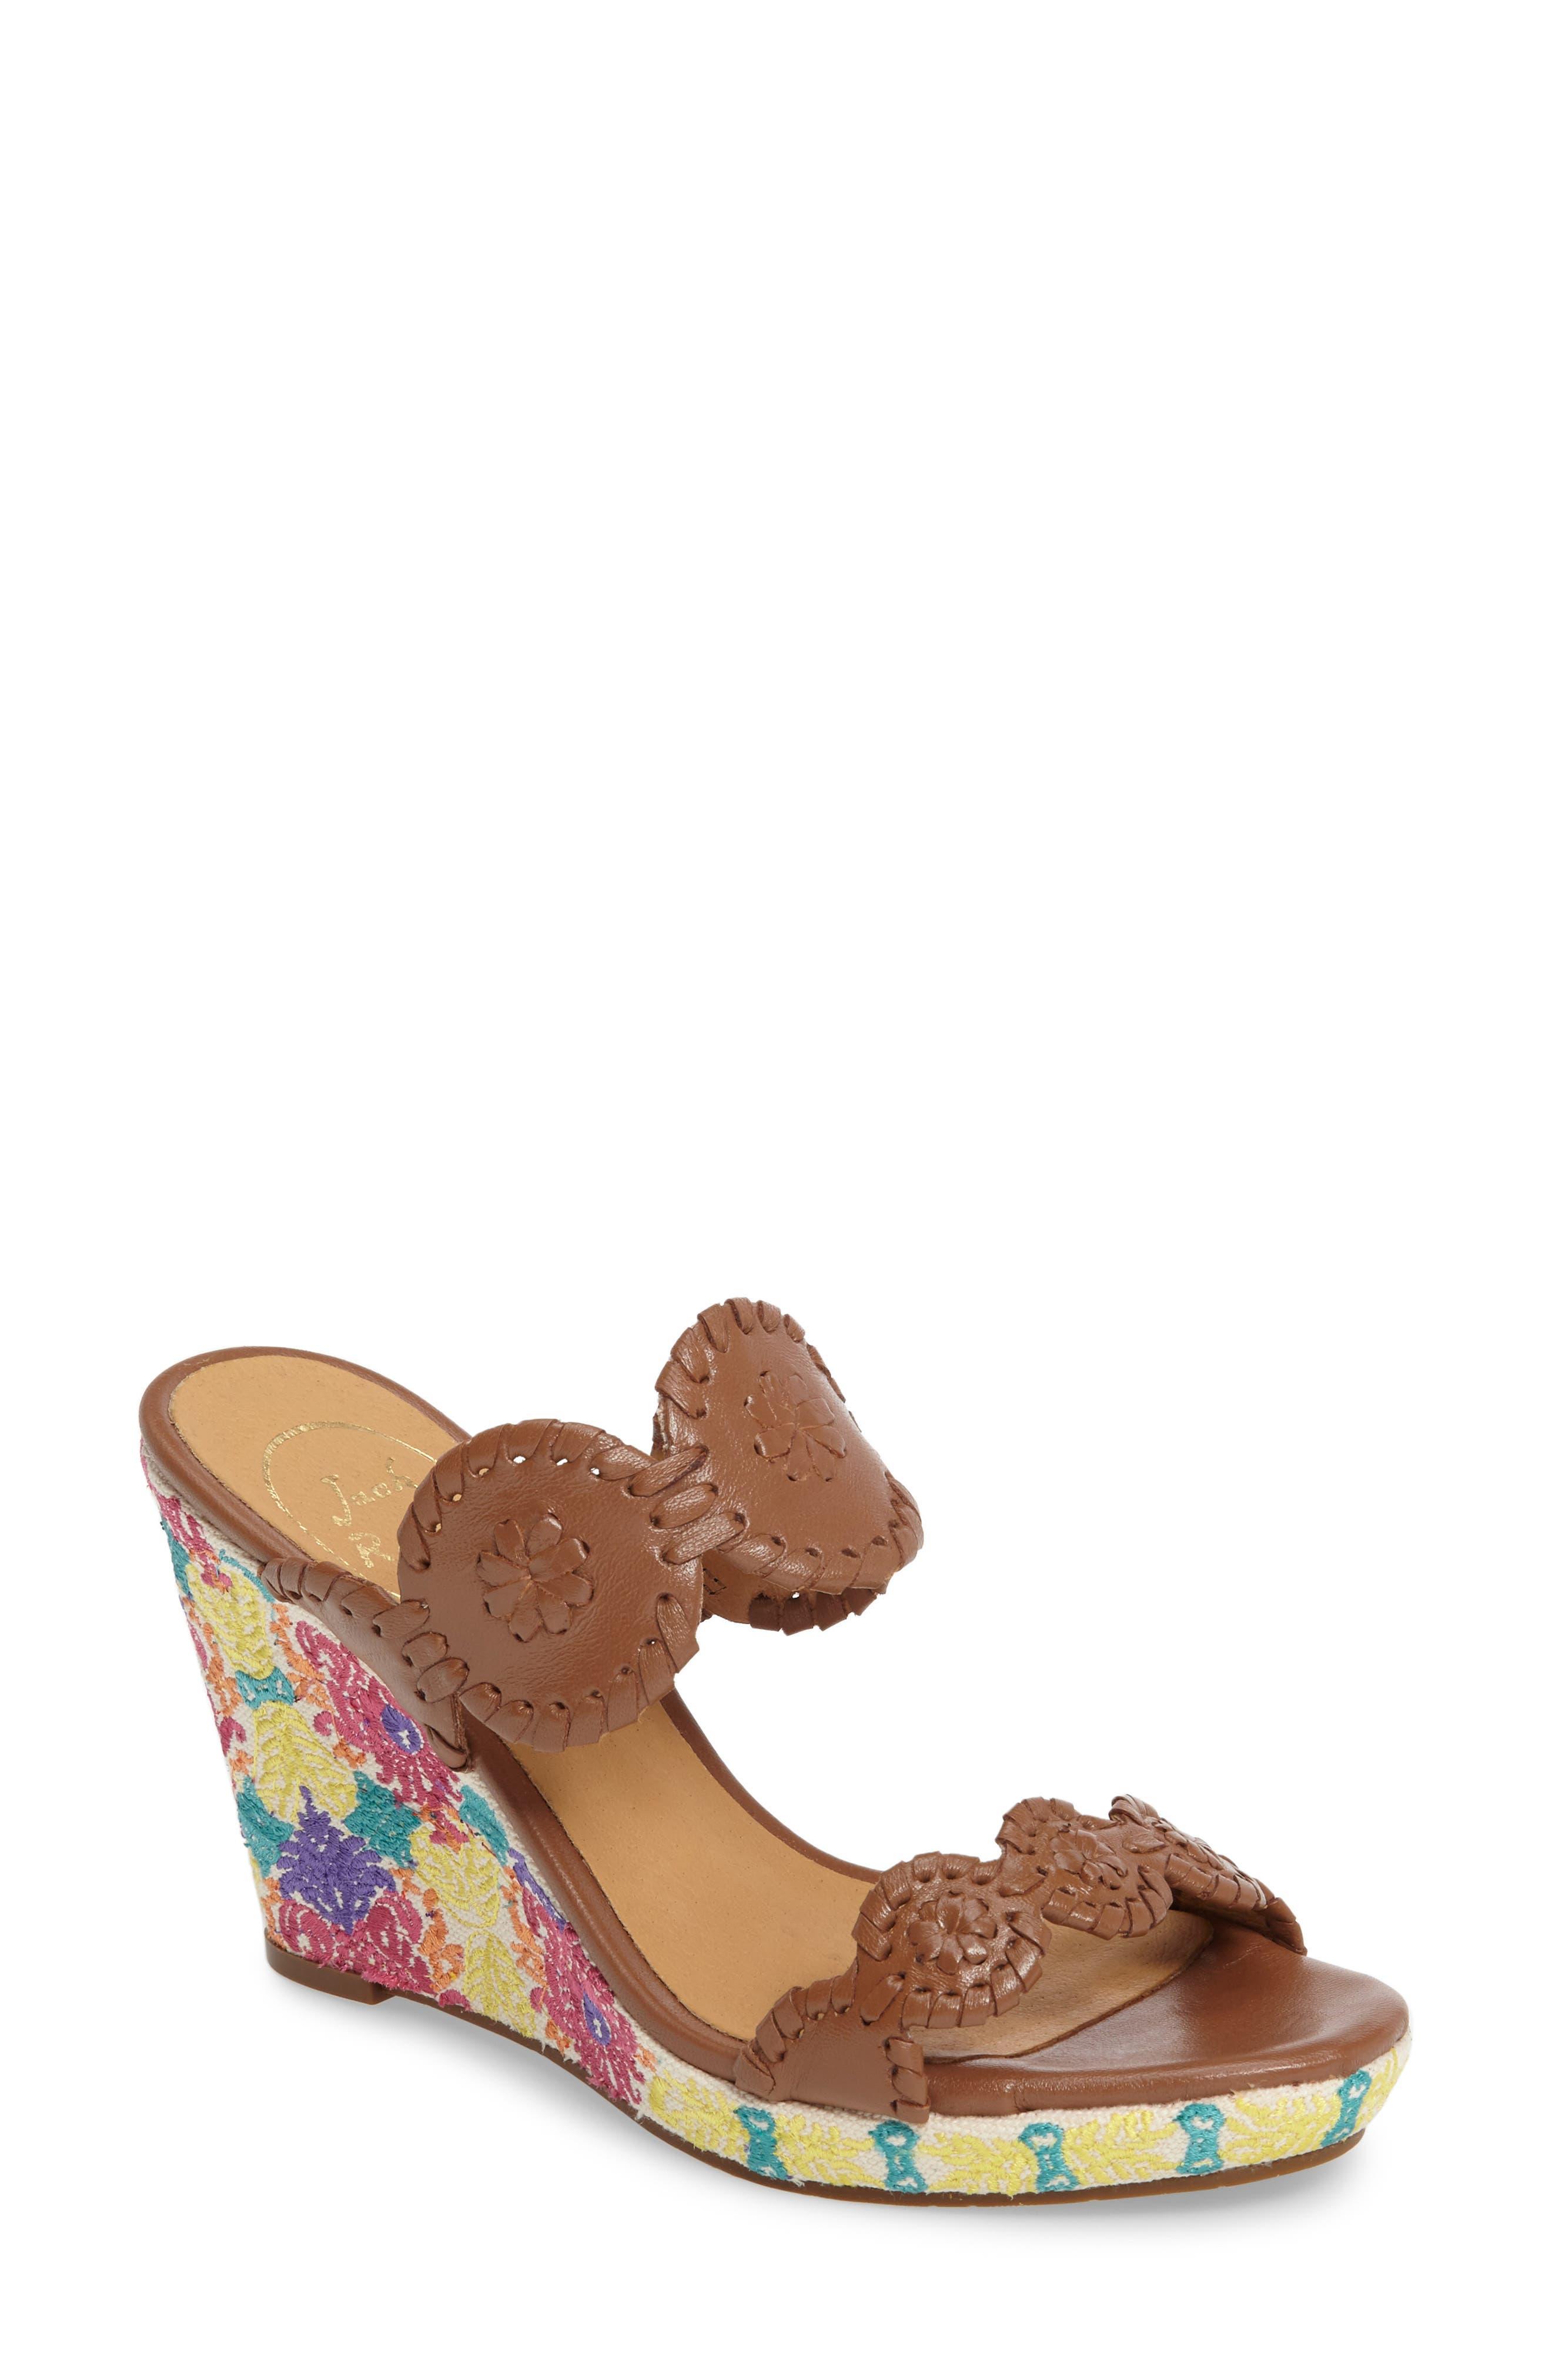 Livvy Wedge Slide Sandal,                             Main thumbnail 1, color,                             Cognac Leather